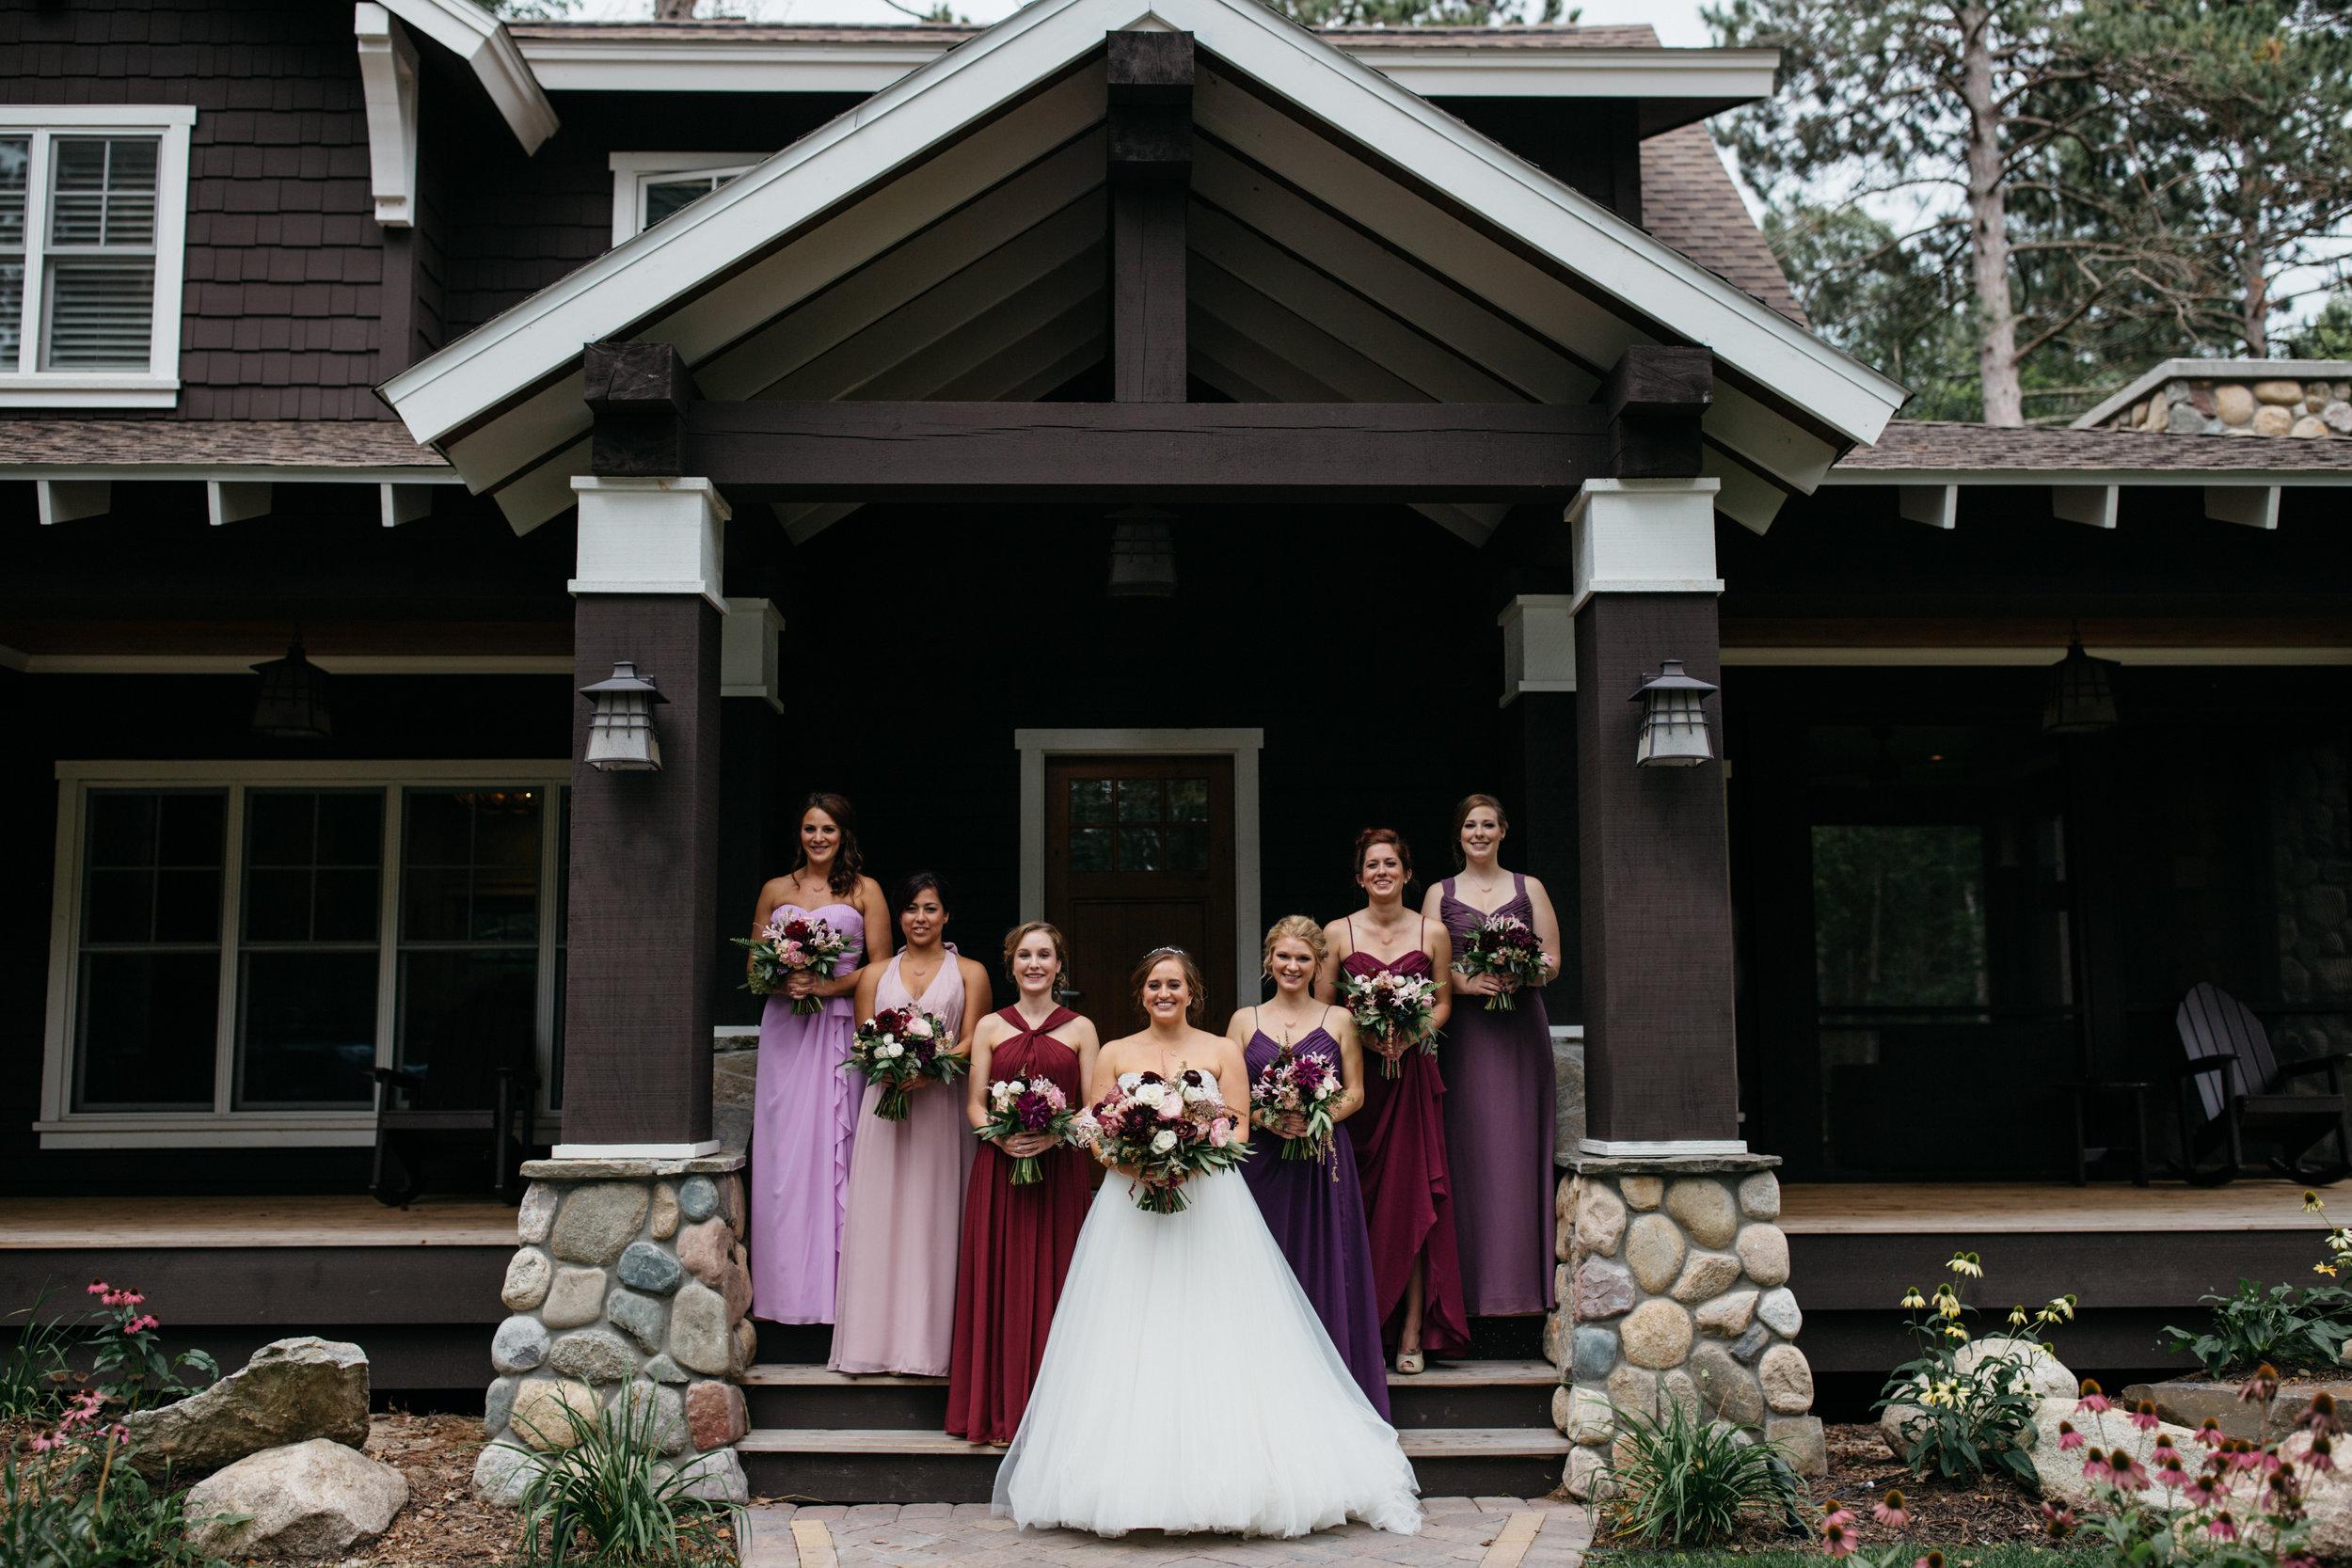 Northern Minnesota cabin wedding. Photography by Britt DeZeeuw at Grand View Lodge